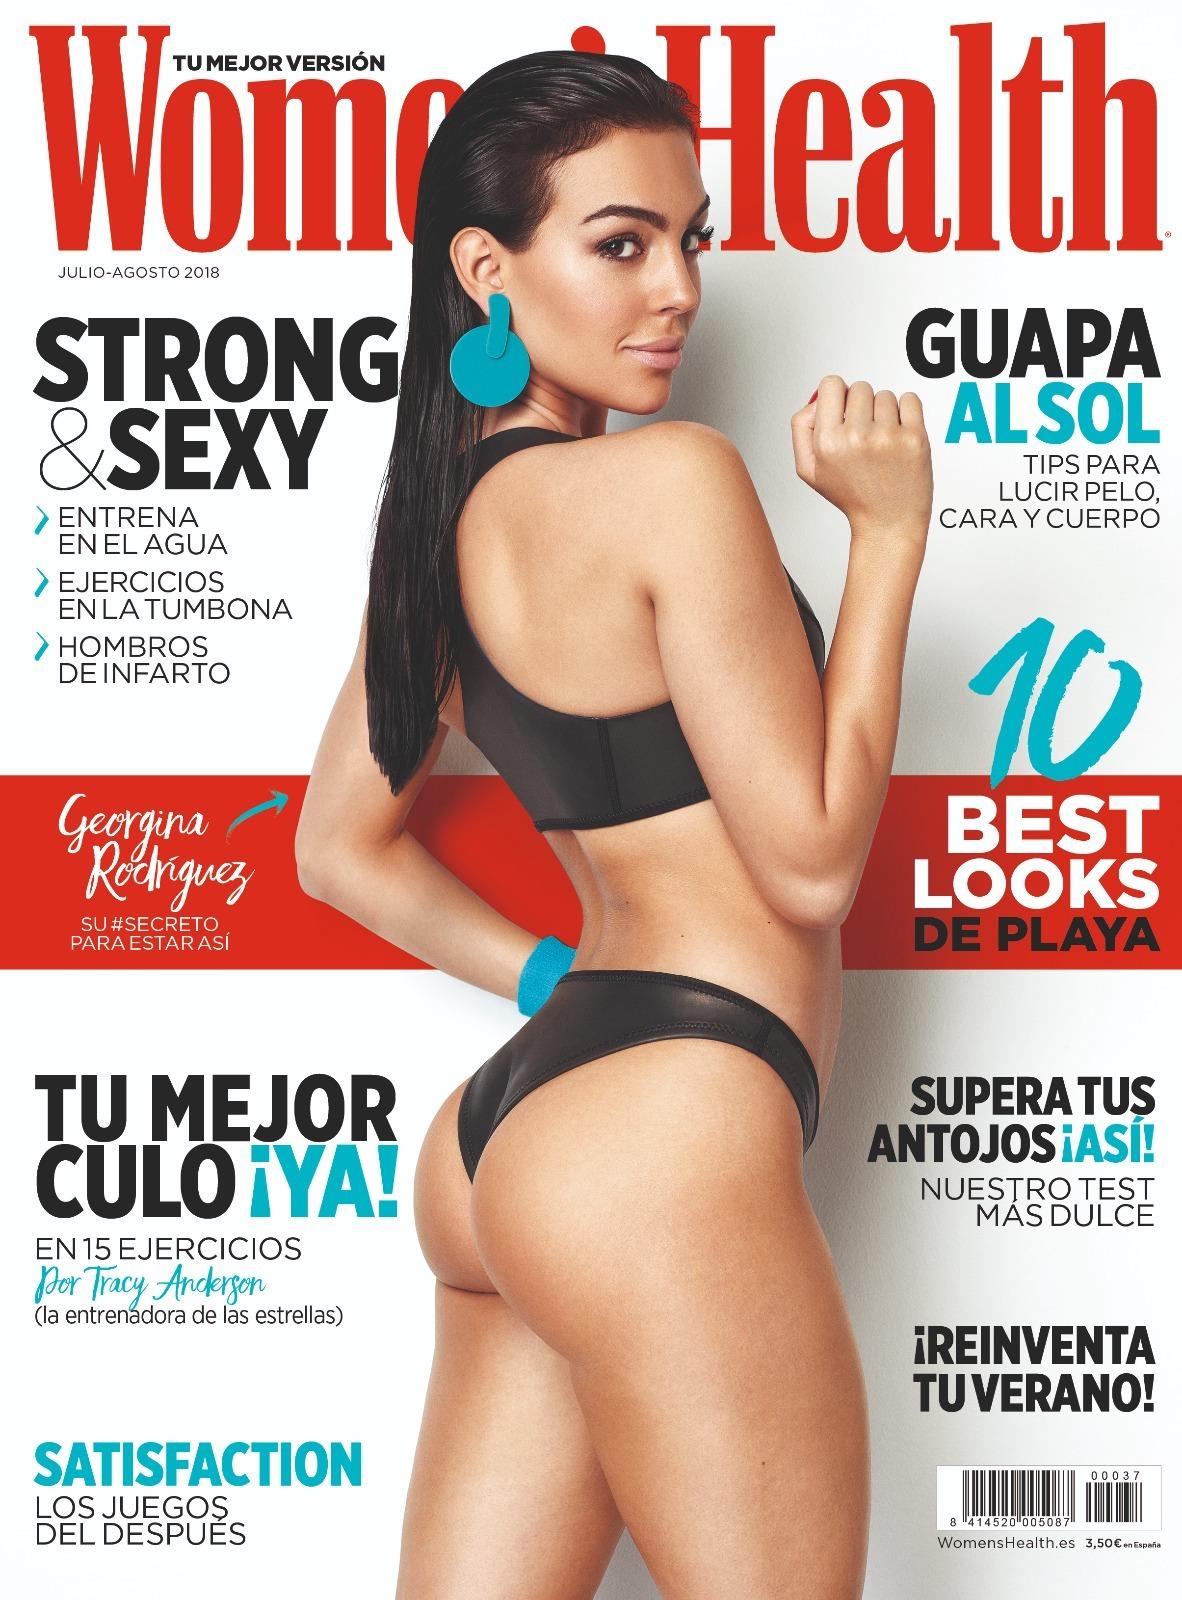 Portada de Women's Health con Georgina Rodríguez, novia de Cristiano...